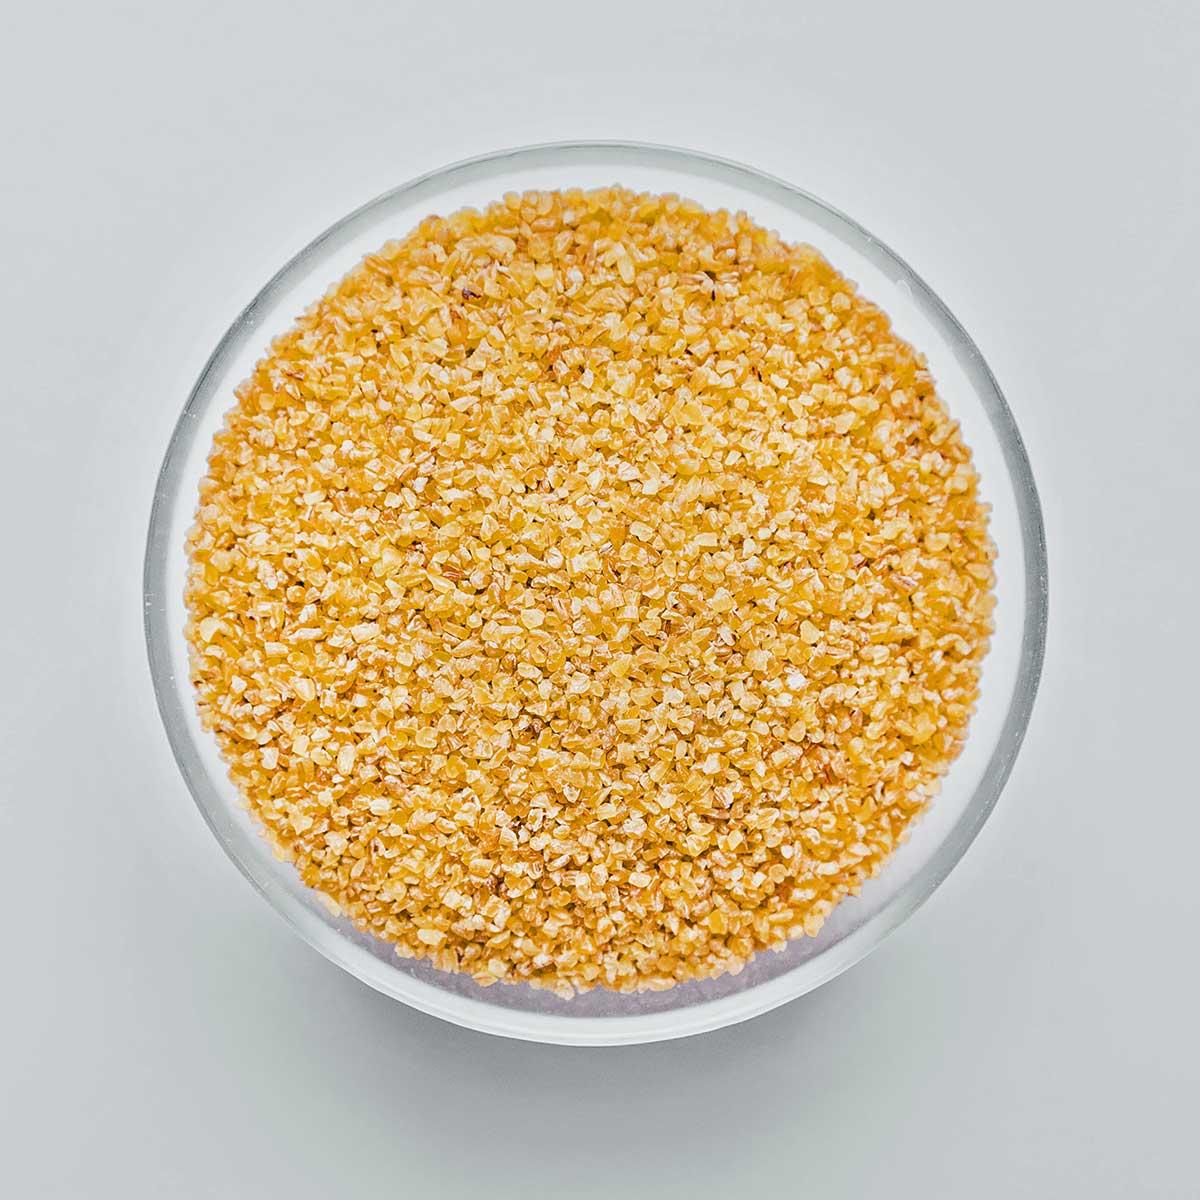 Bulgur grains in a bowl